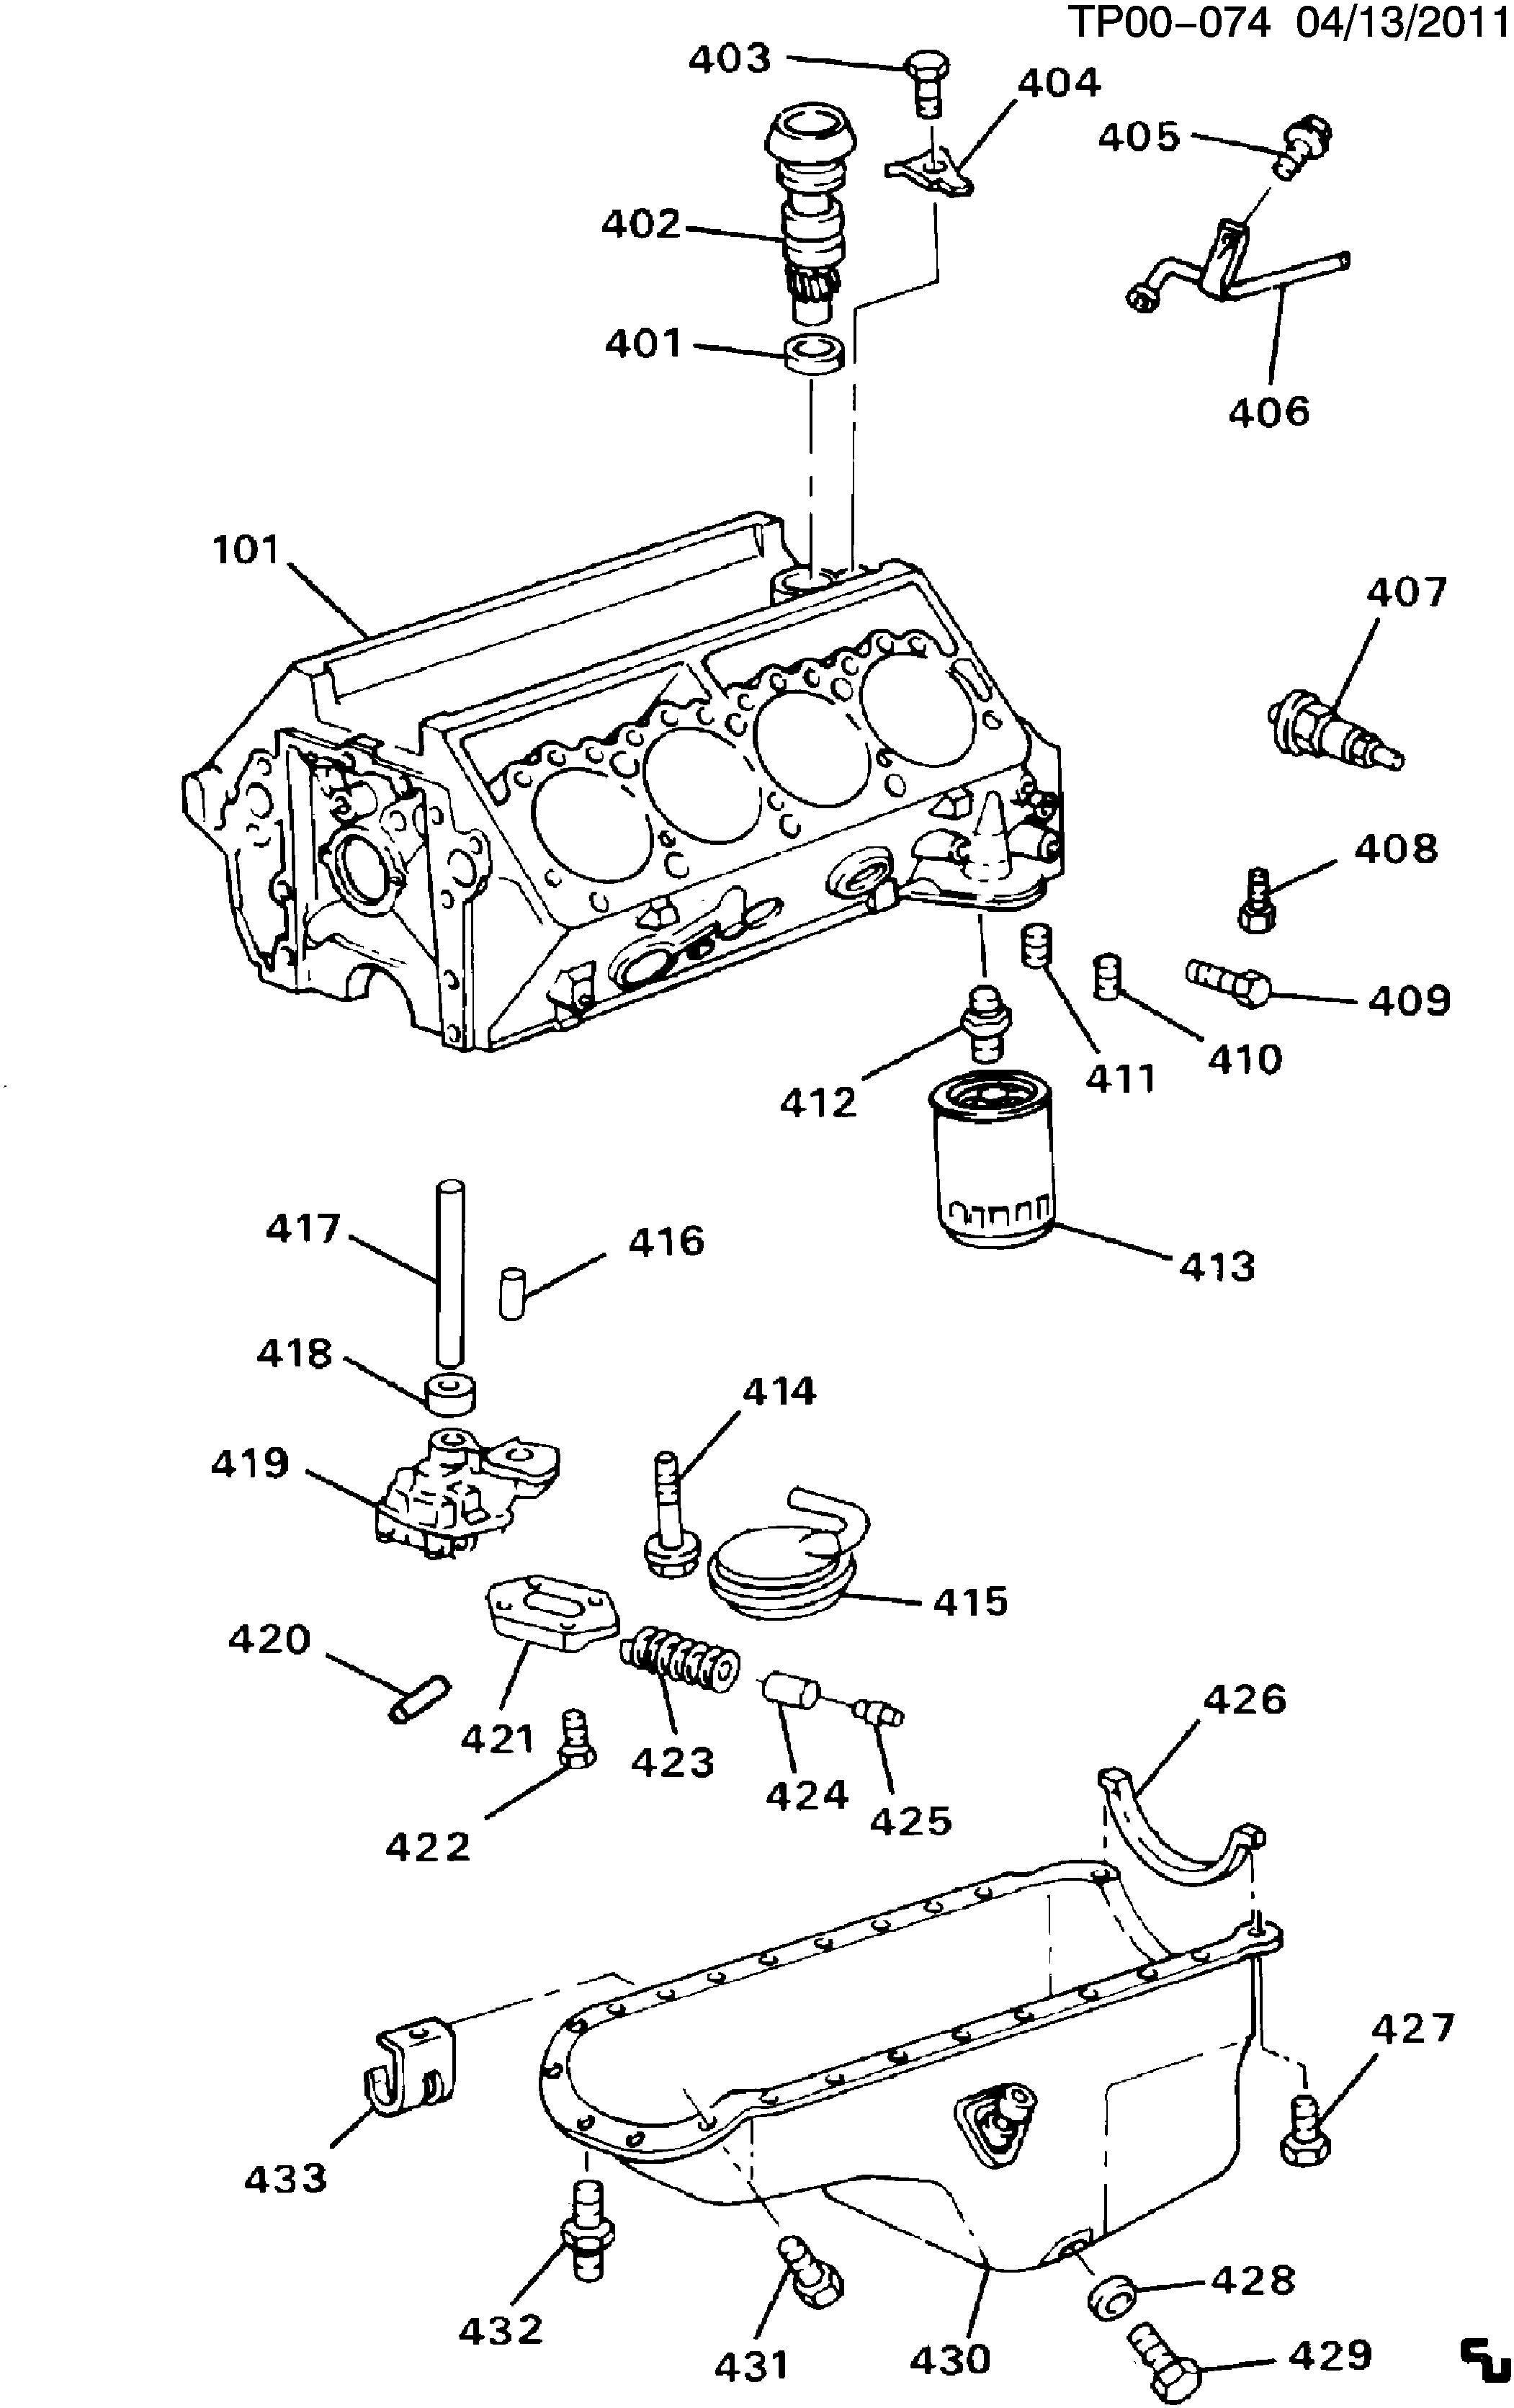 Chevrolet Blazer Spring Engine Oil Pressure